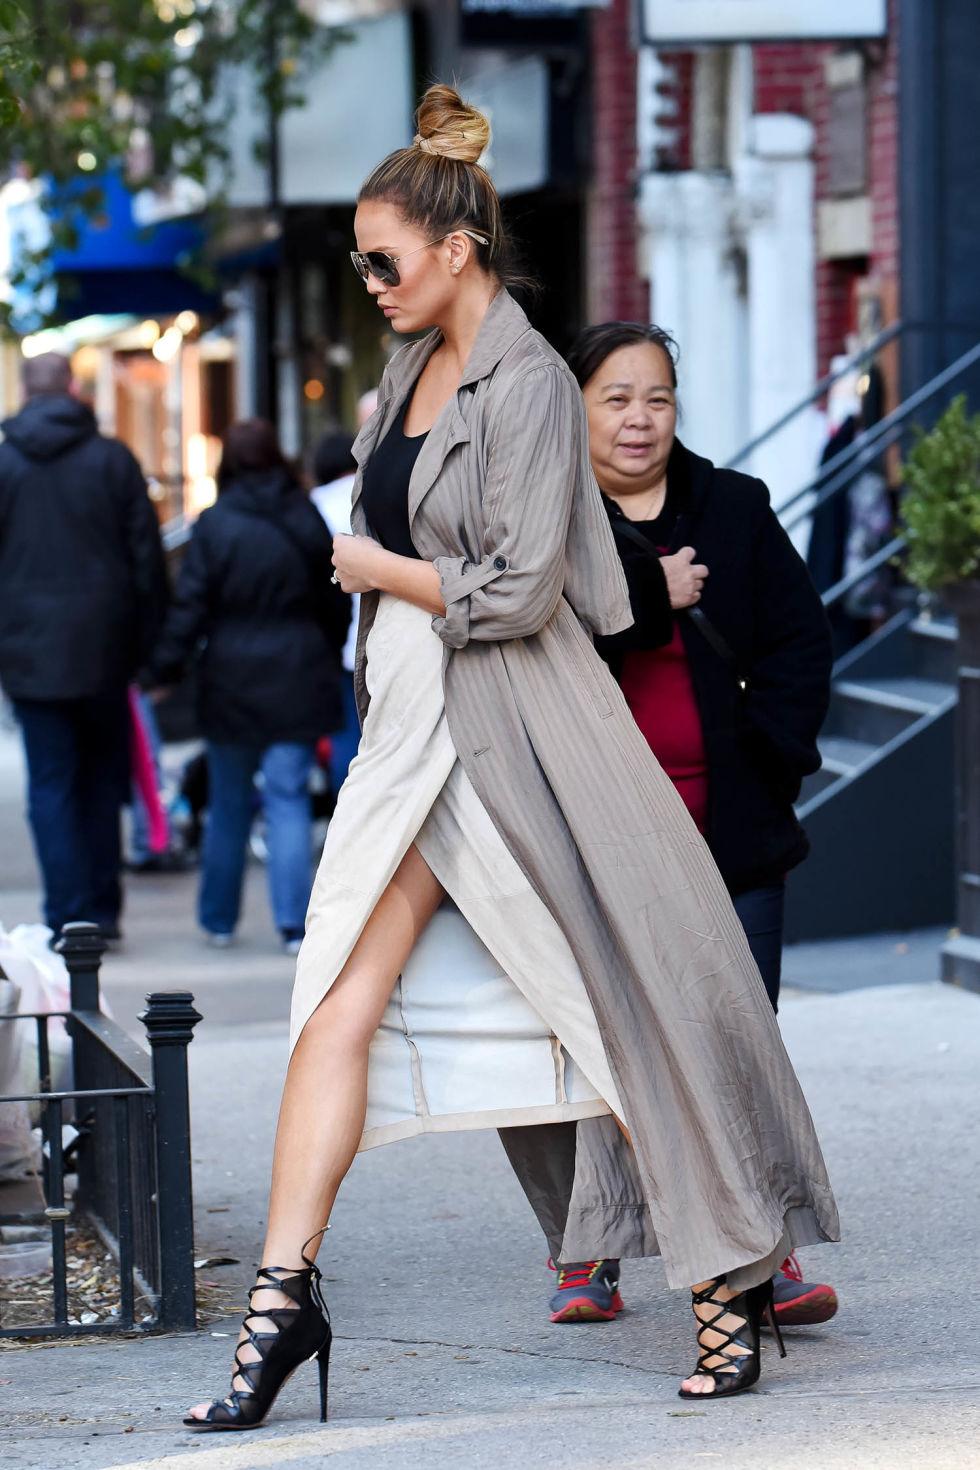 Street Style Inspiration | Fashion